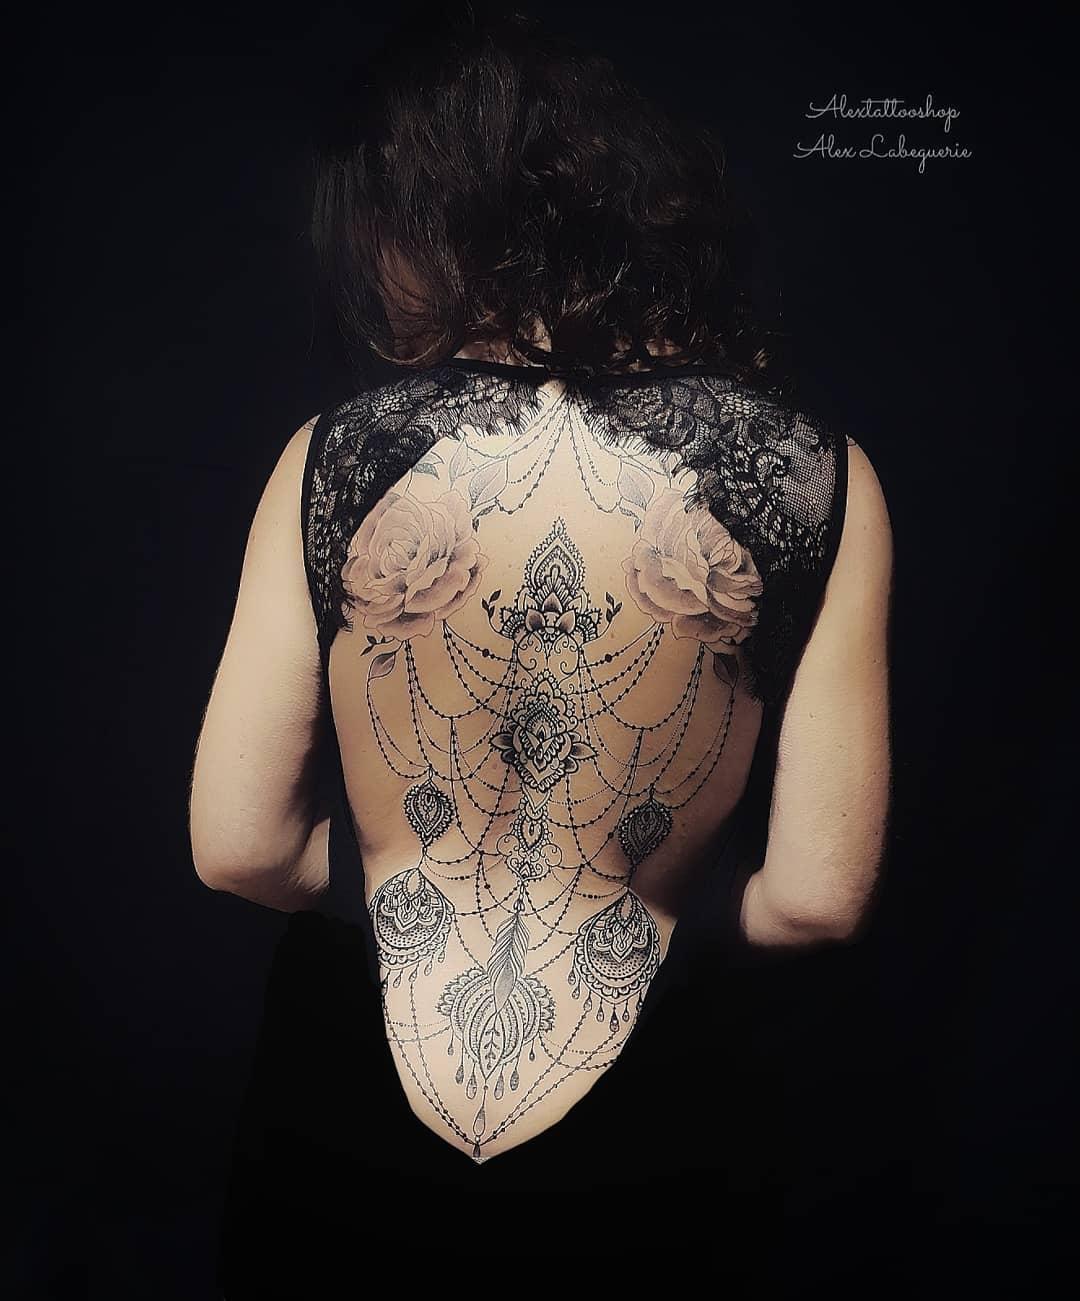 tattoo mandala by @alexlabeguerie_alextattooshop